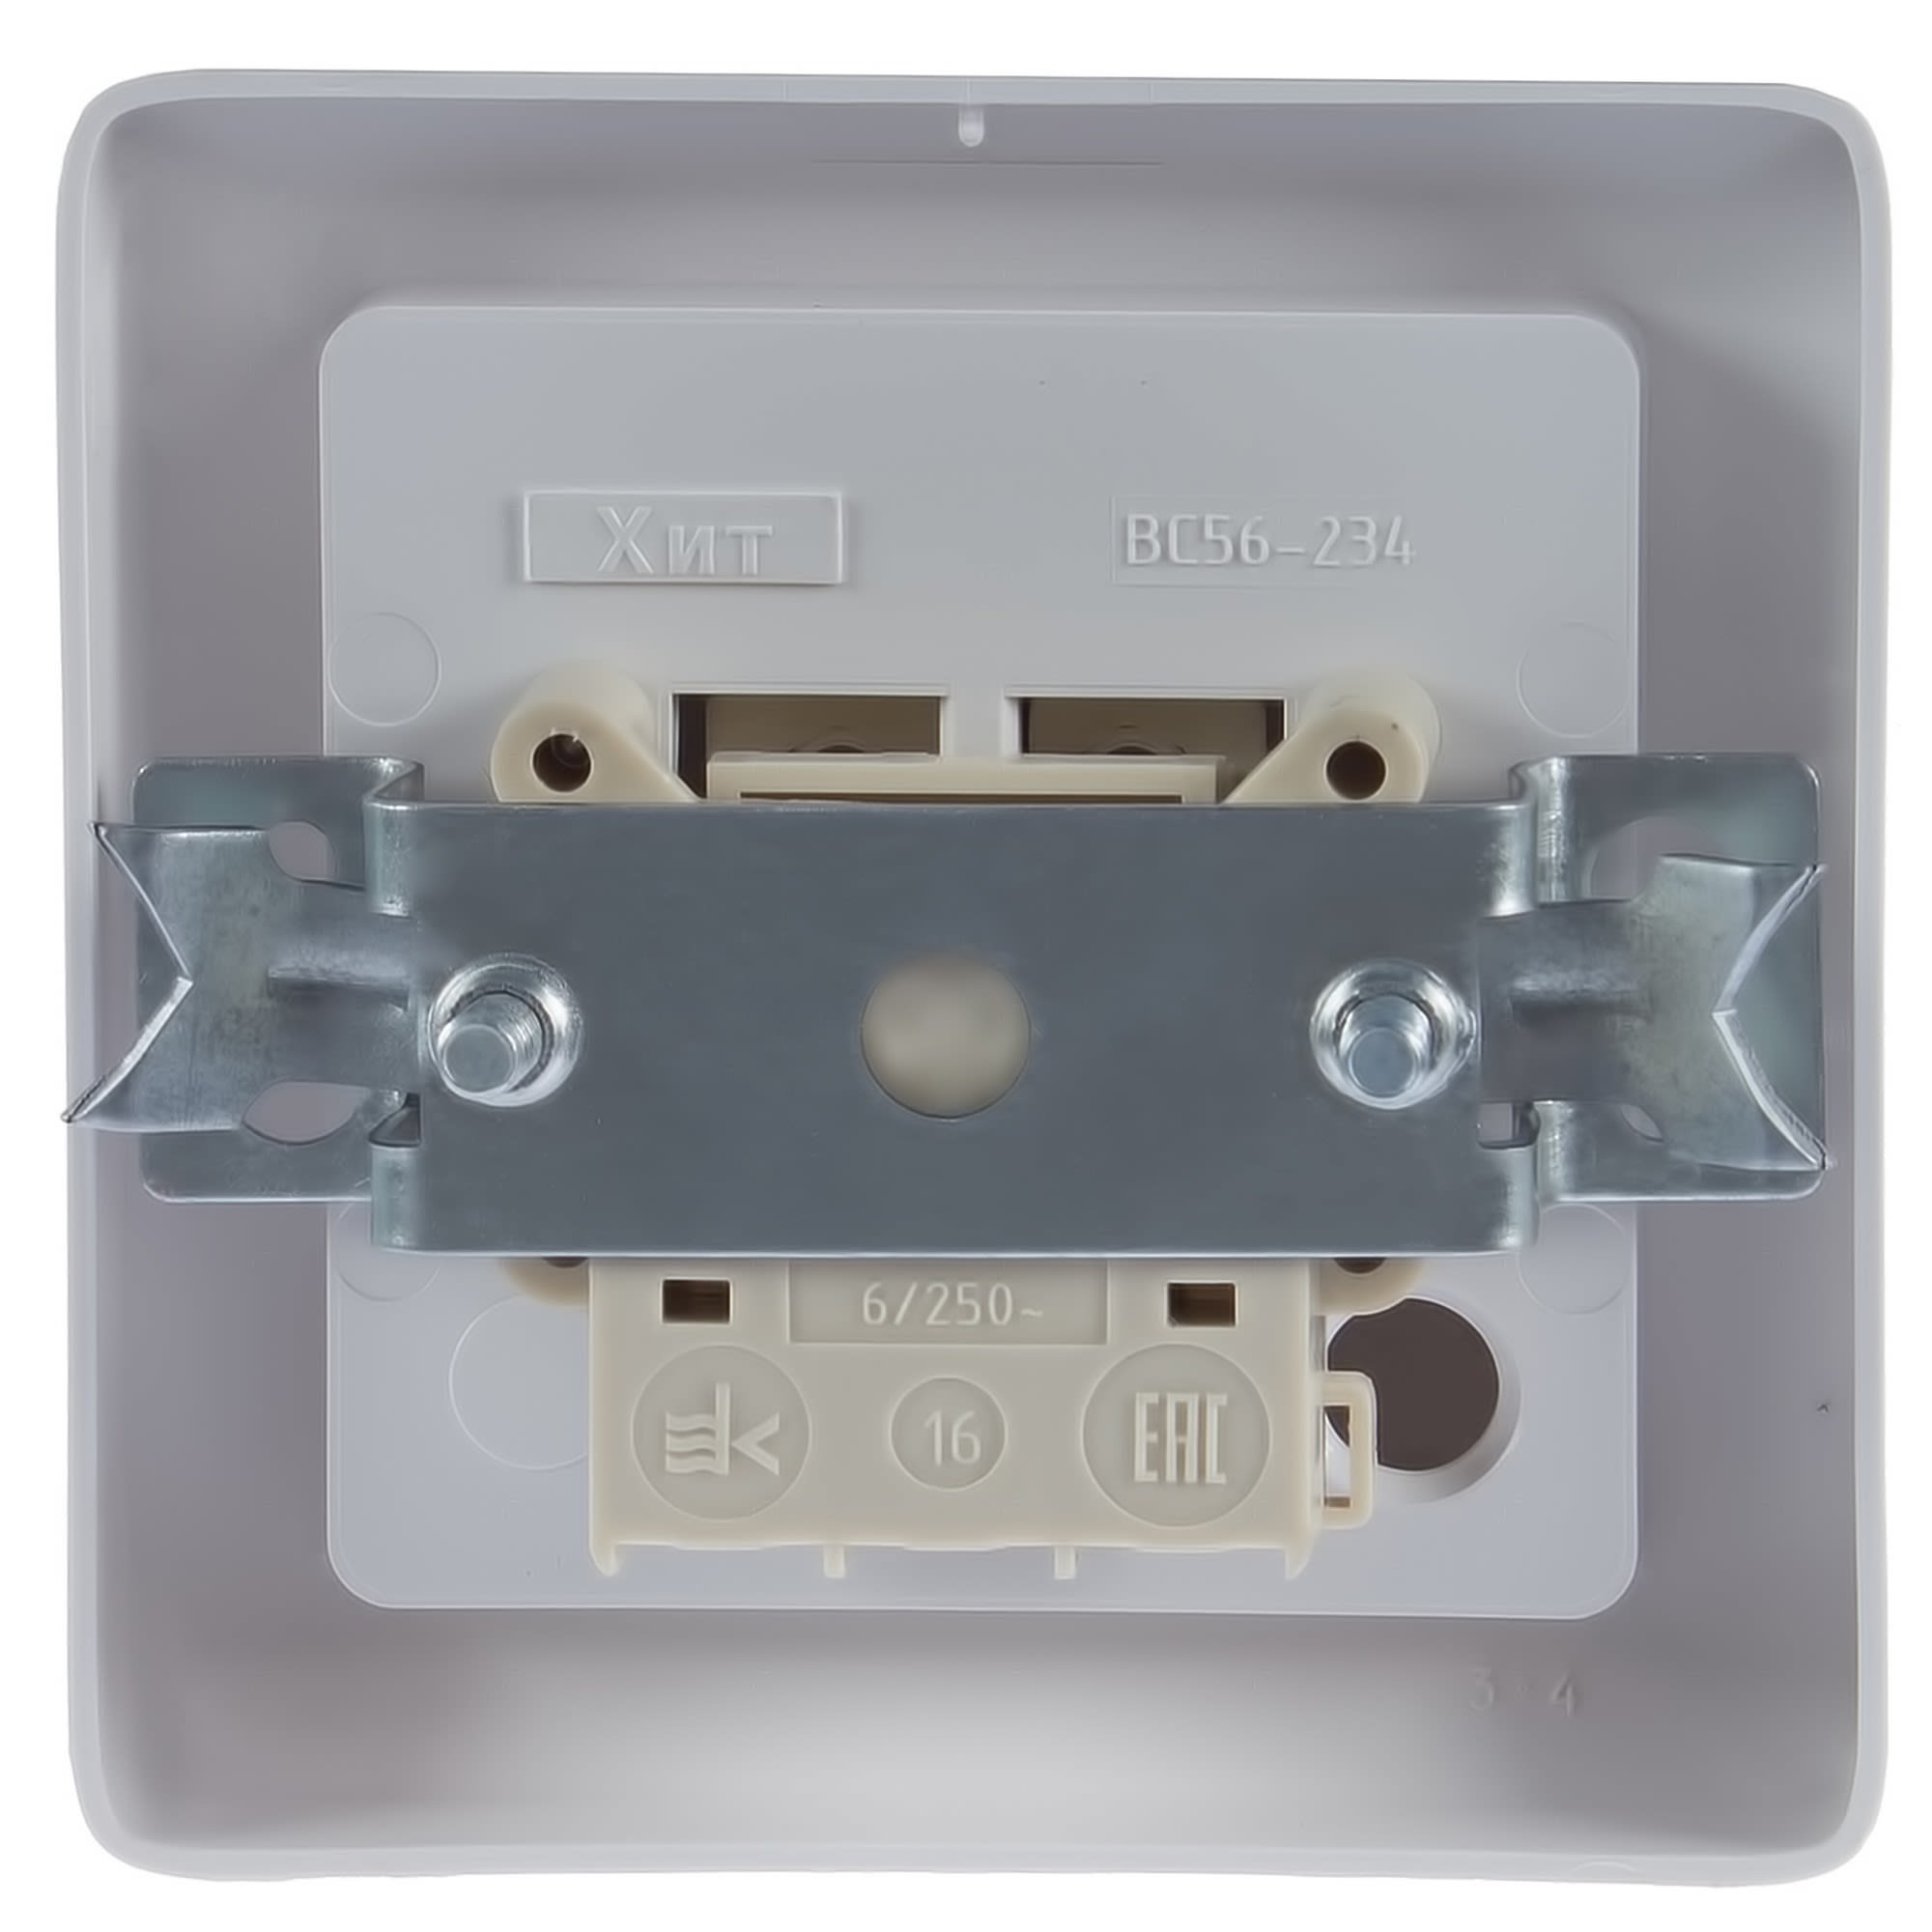 6177cca02e1e Выключатель Schneider Electric Хит 2 клавиши скрытая установка цвет ...